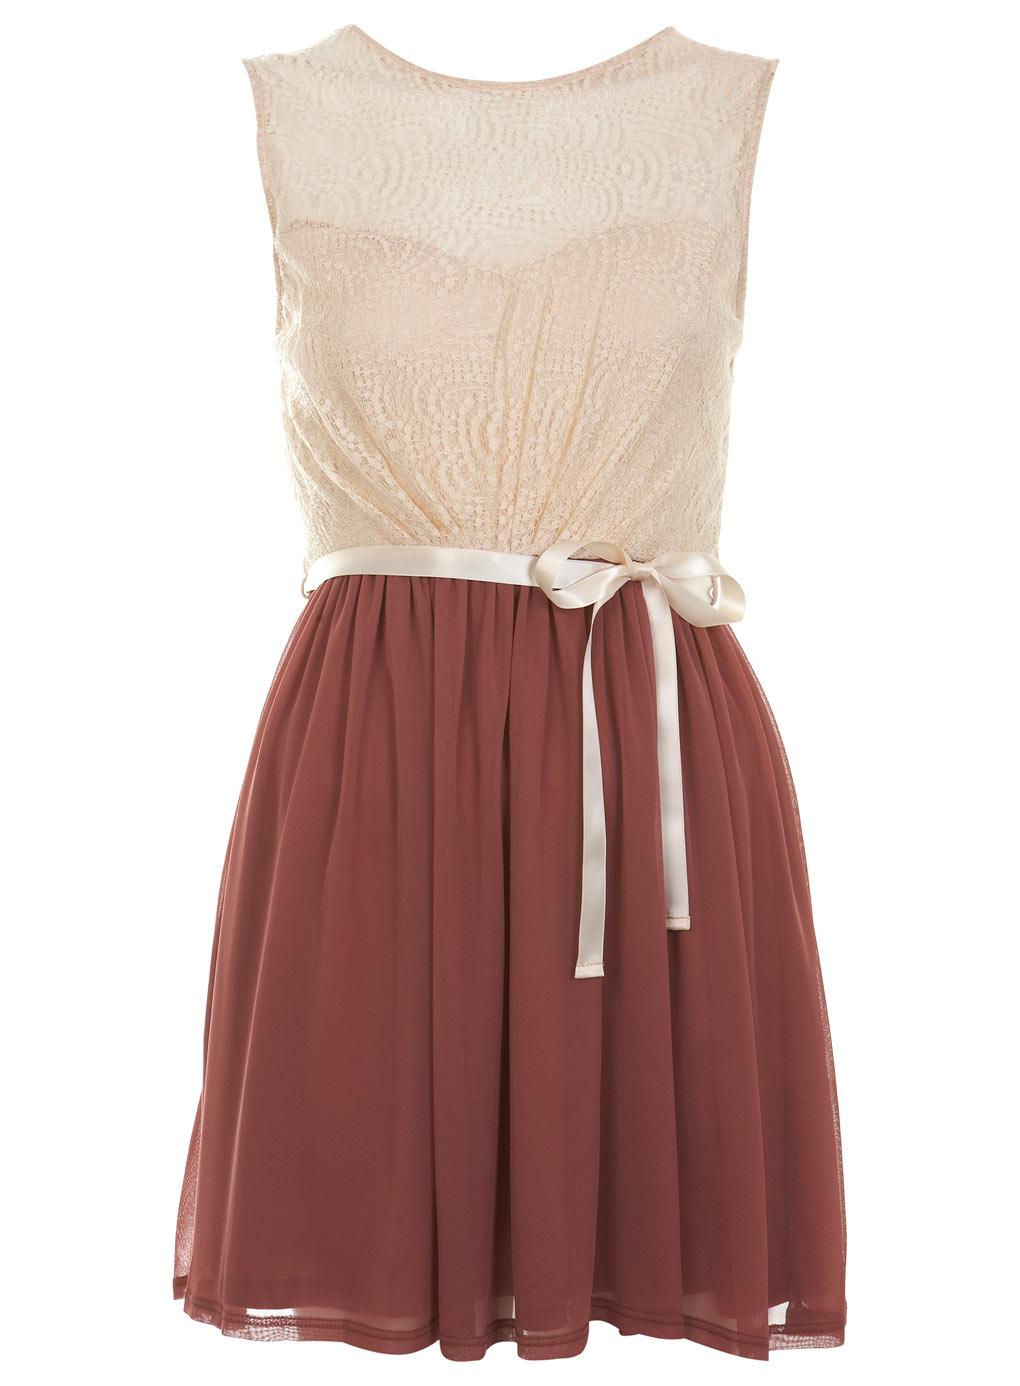 Lace Skater Dresses Picture Collection Dressedupgirl Com